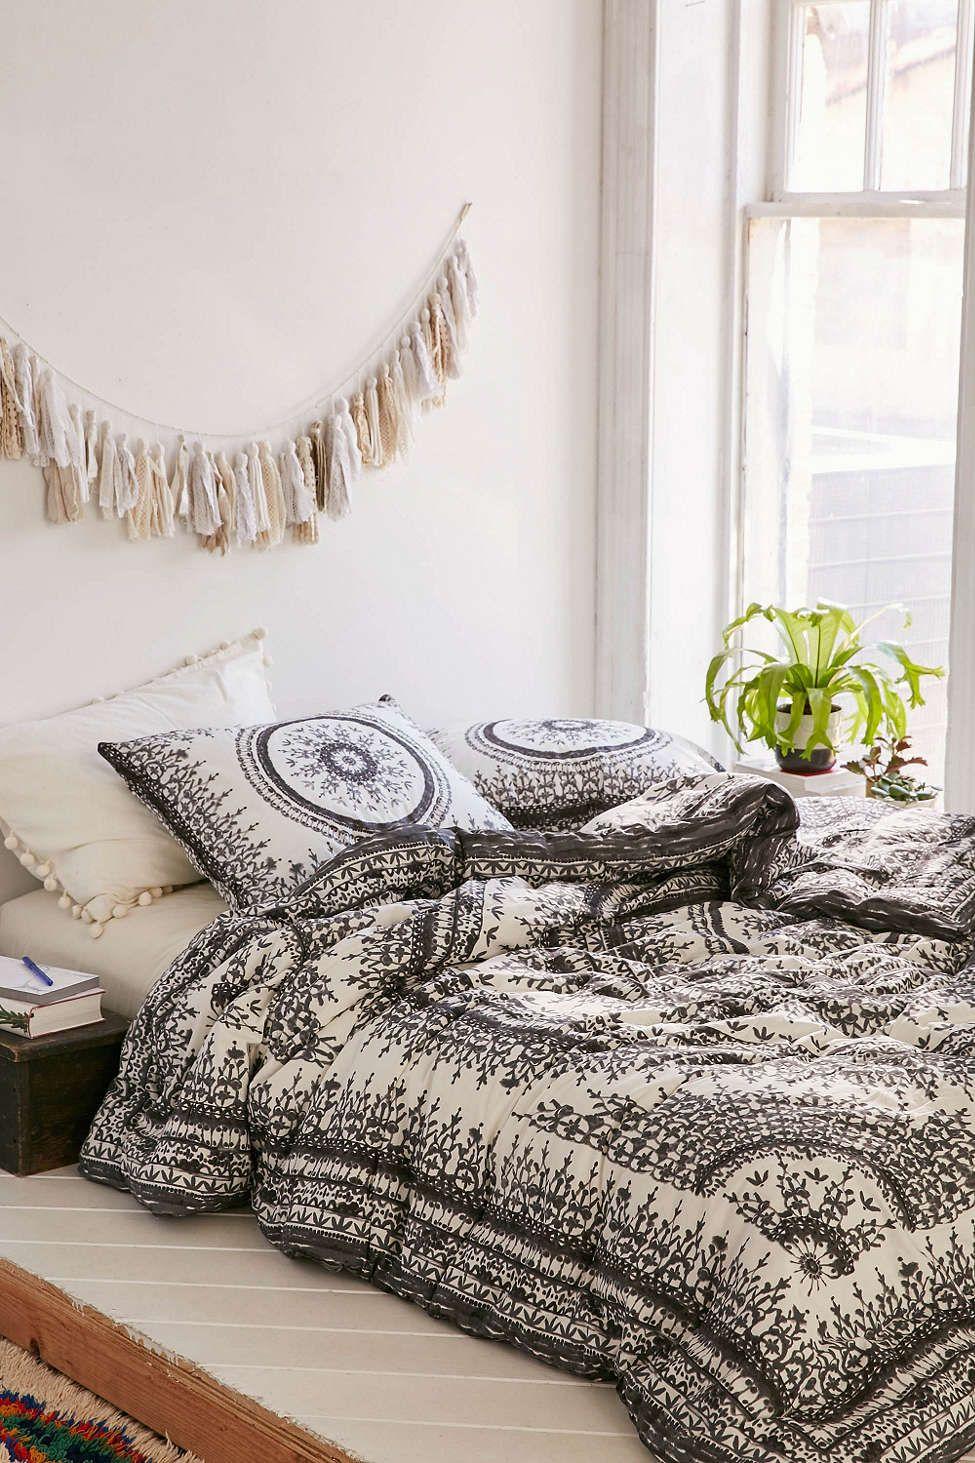 appealing plum bedroom decor   Plum & Bow Effie Medallion Comforter   Bedroom   Home ...